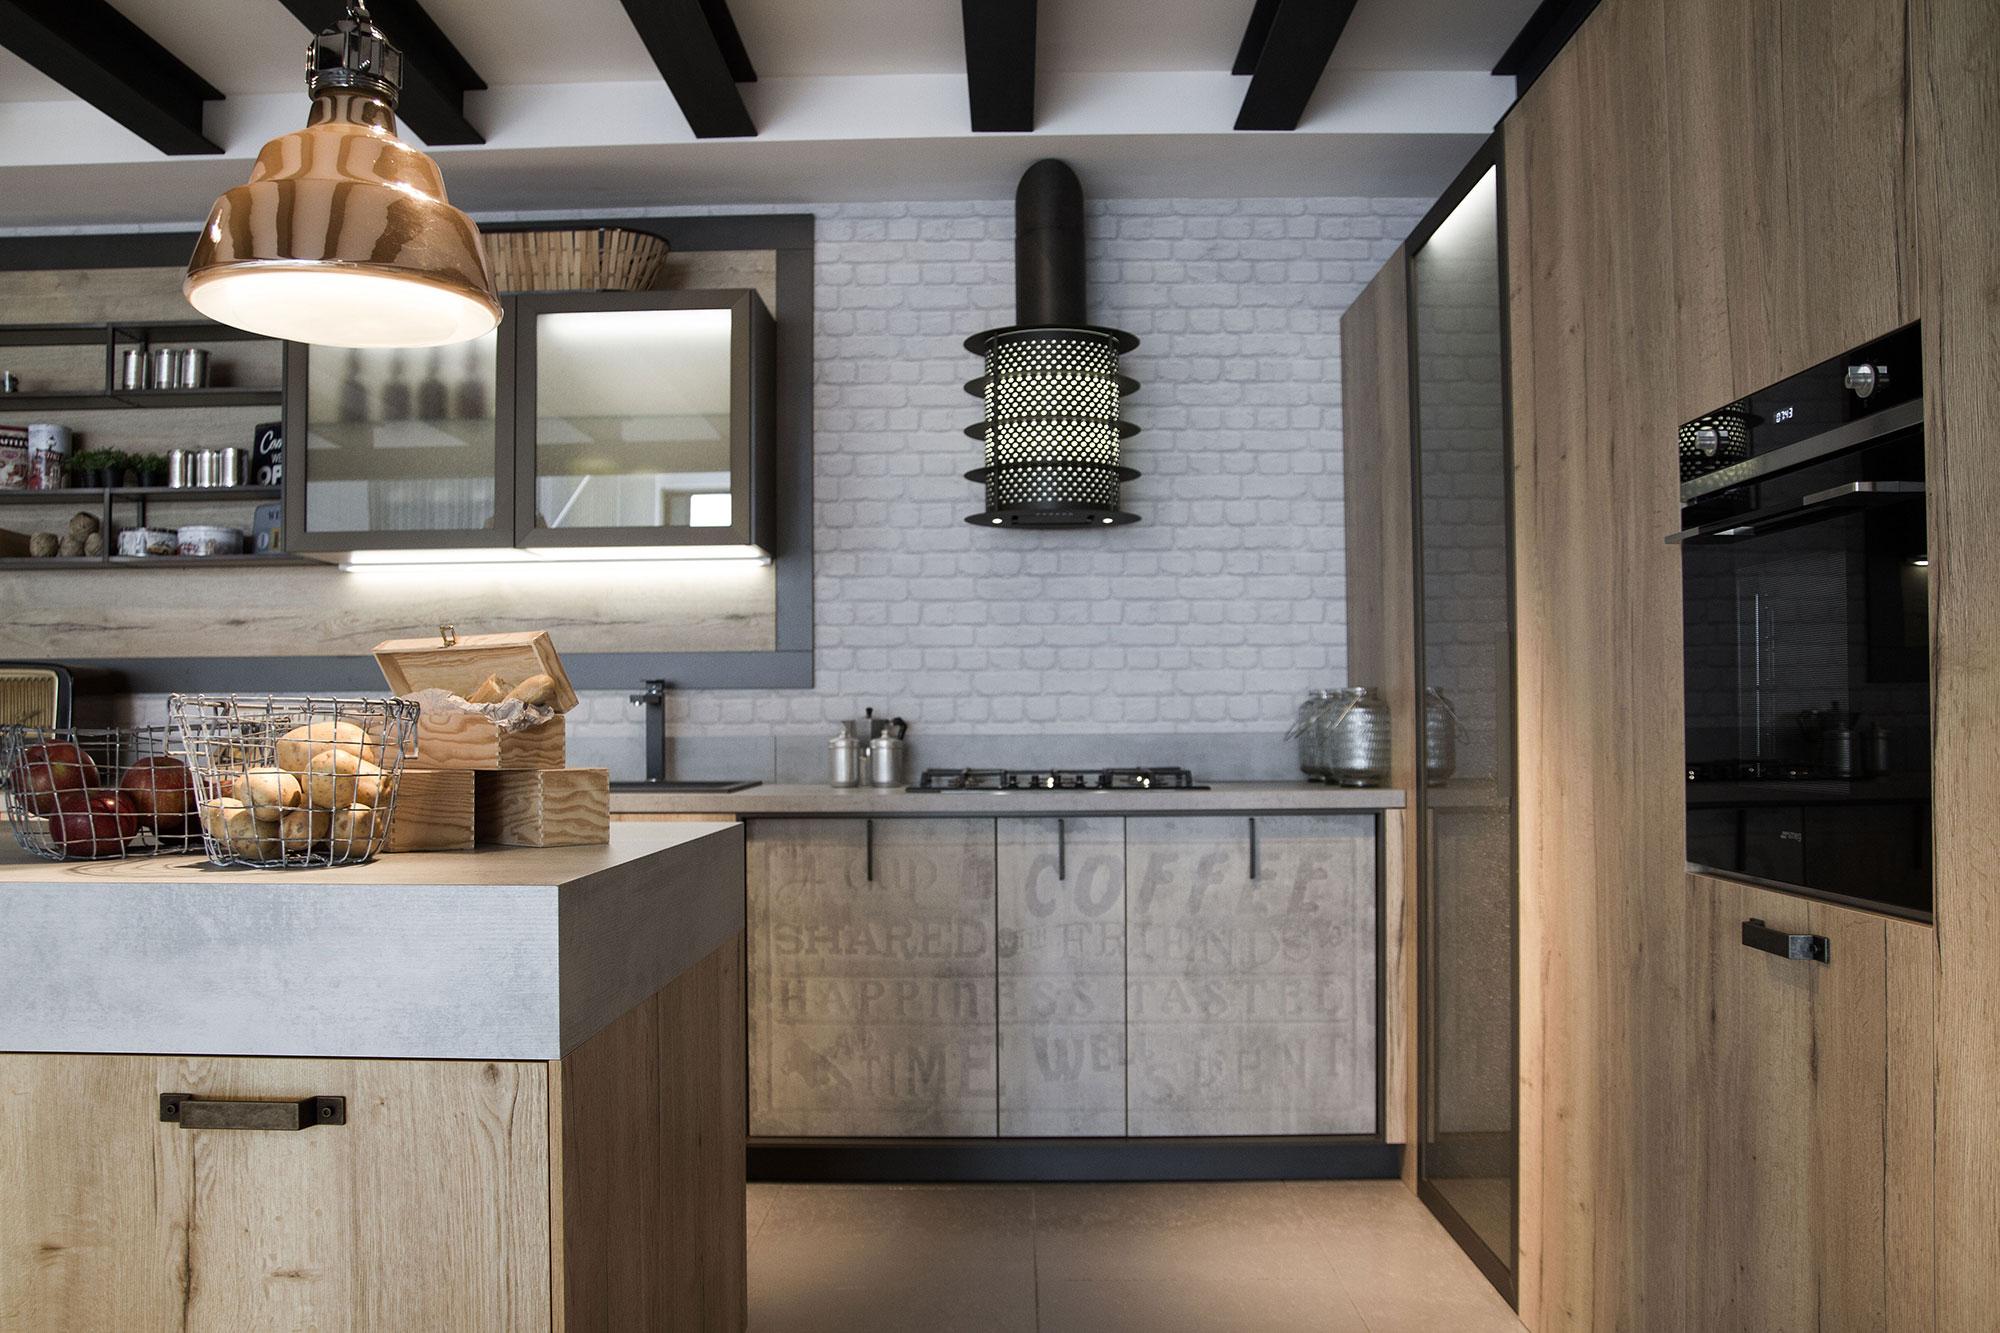 Jm cuisines loft cuisine jm cuisines cuisiniste orsay bagneux - Rivestimenti murali cucina ...